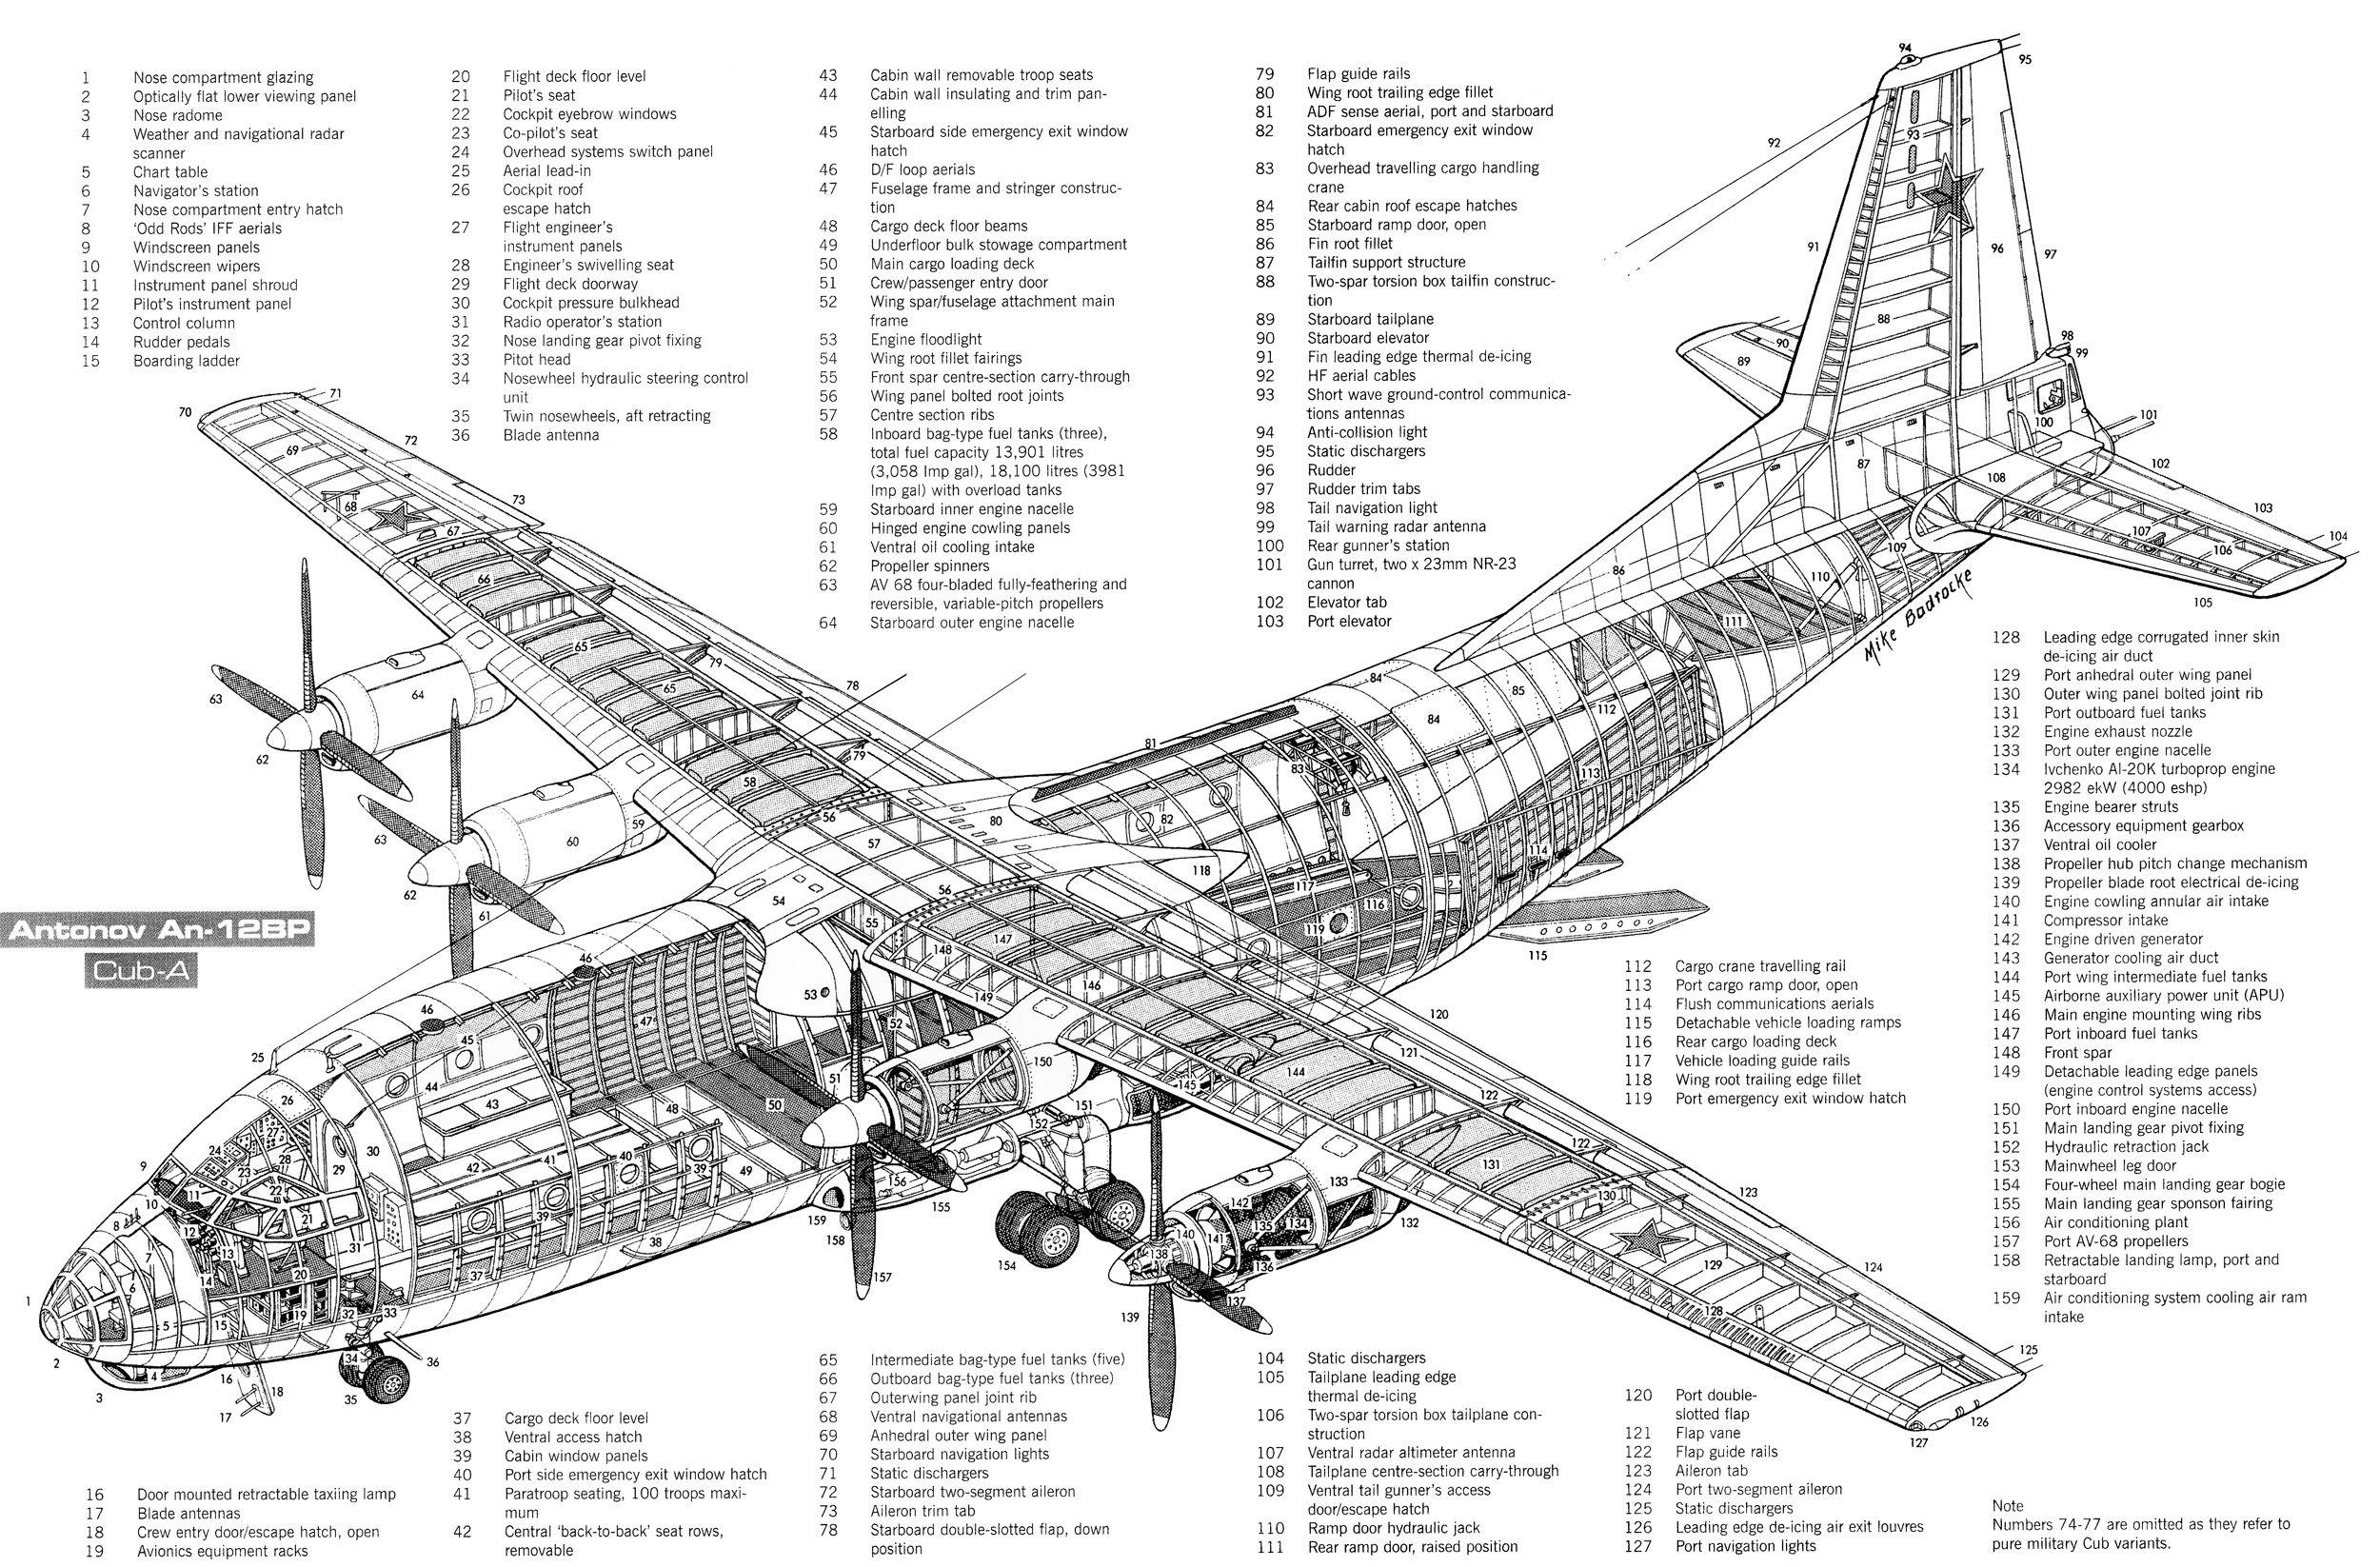 Pin De Siklosi Laszlo Em Avionik